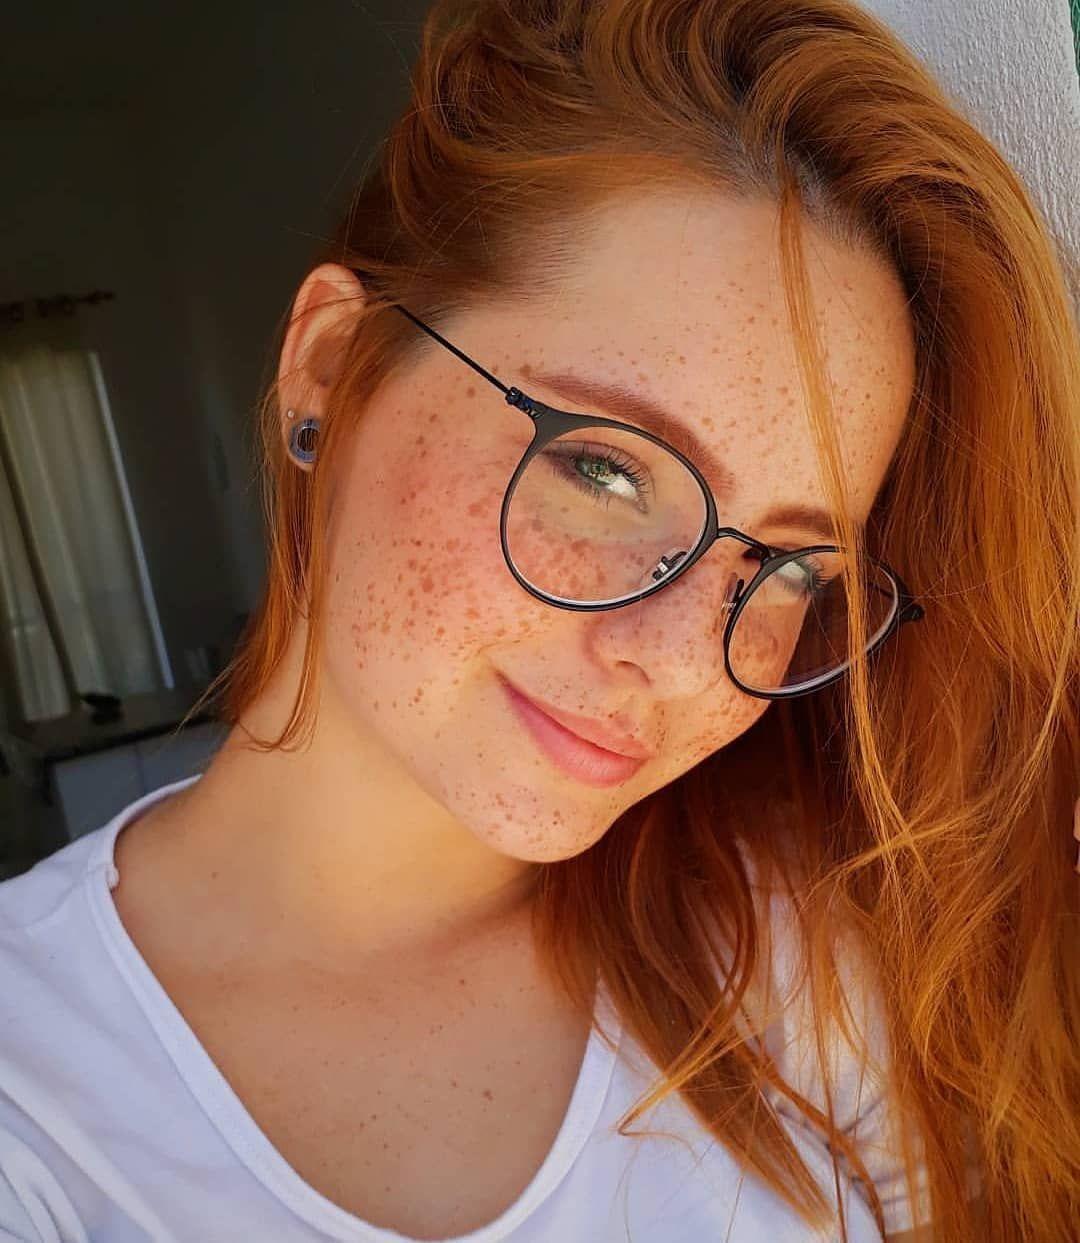 Pin on Rote Haare Sommersprossen